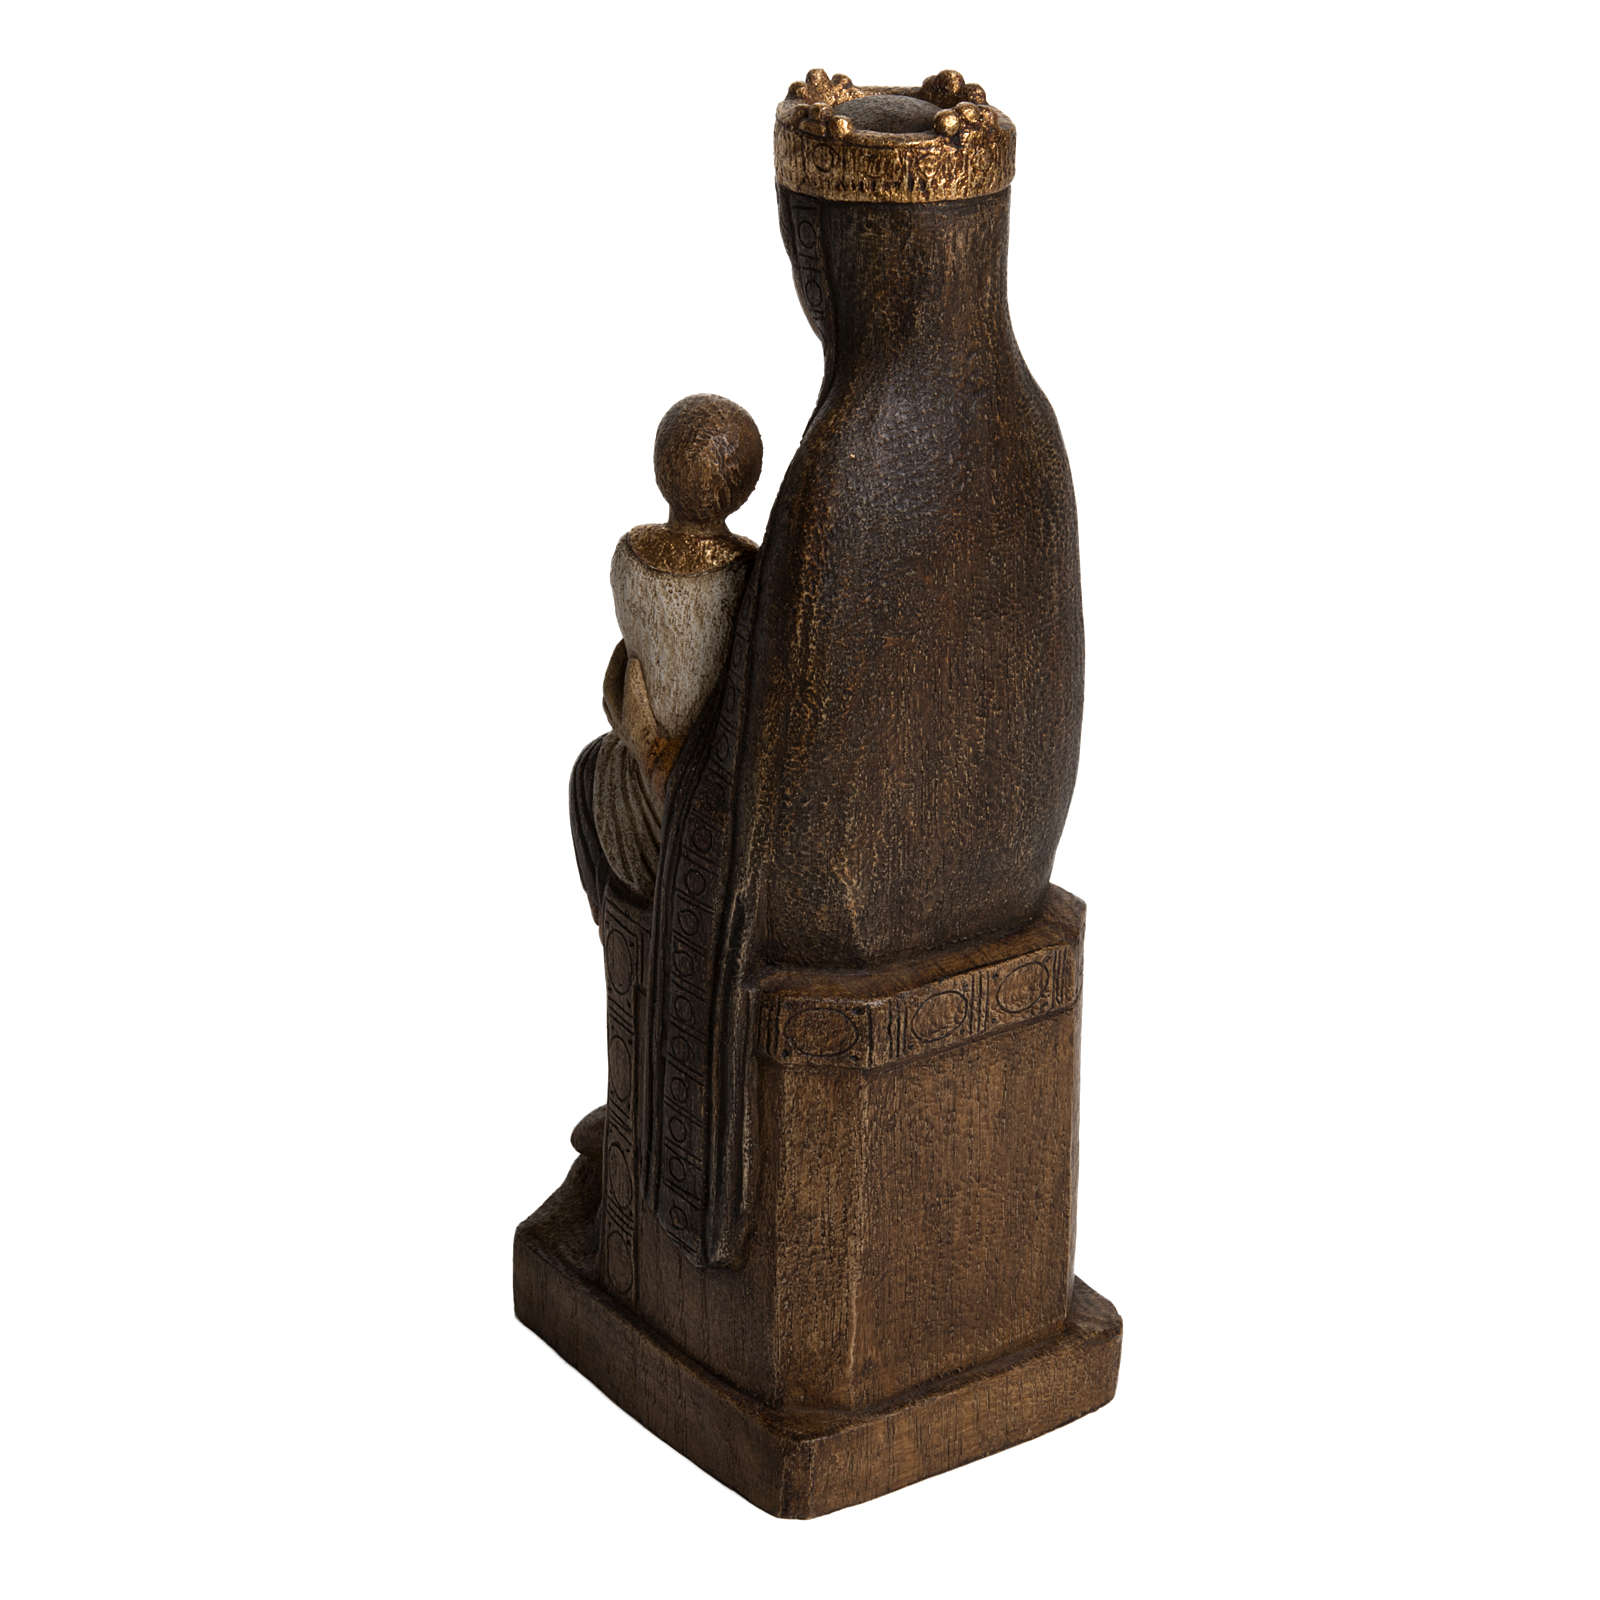 Virgin of Solsona statue in painted Bethléem wood, polychromati 4